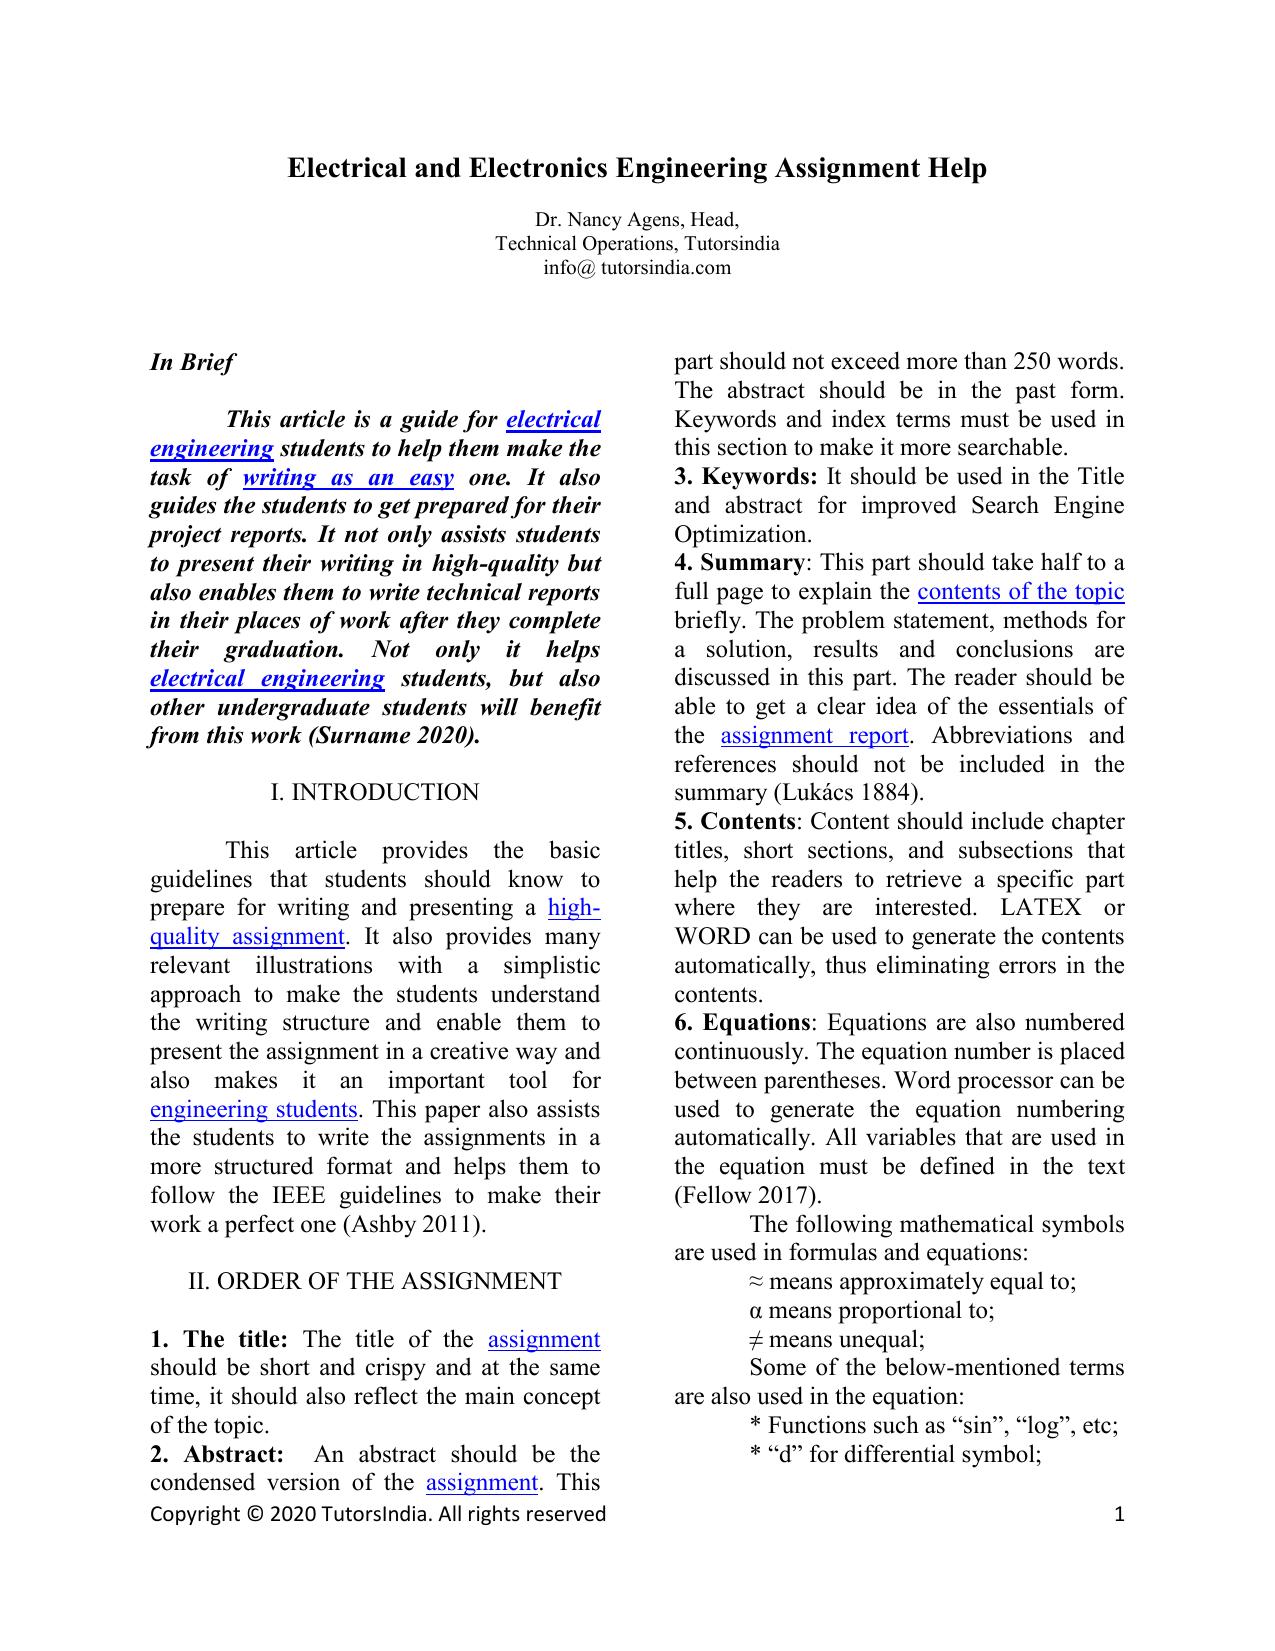 Model mla research paper